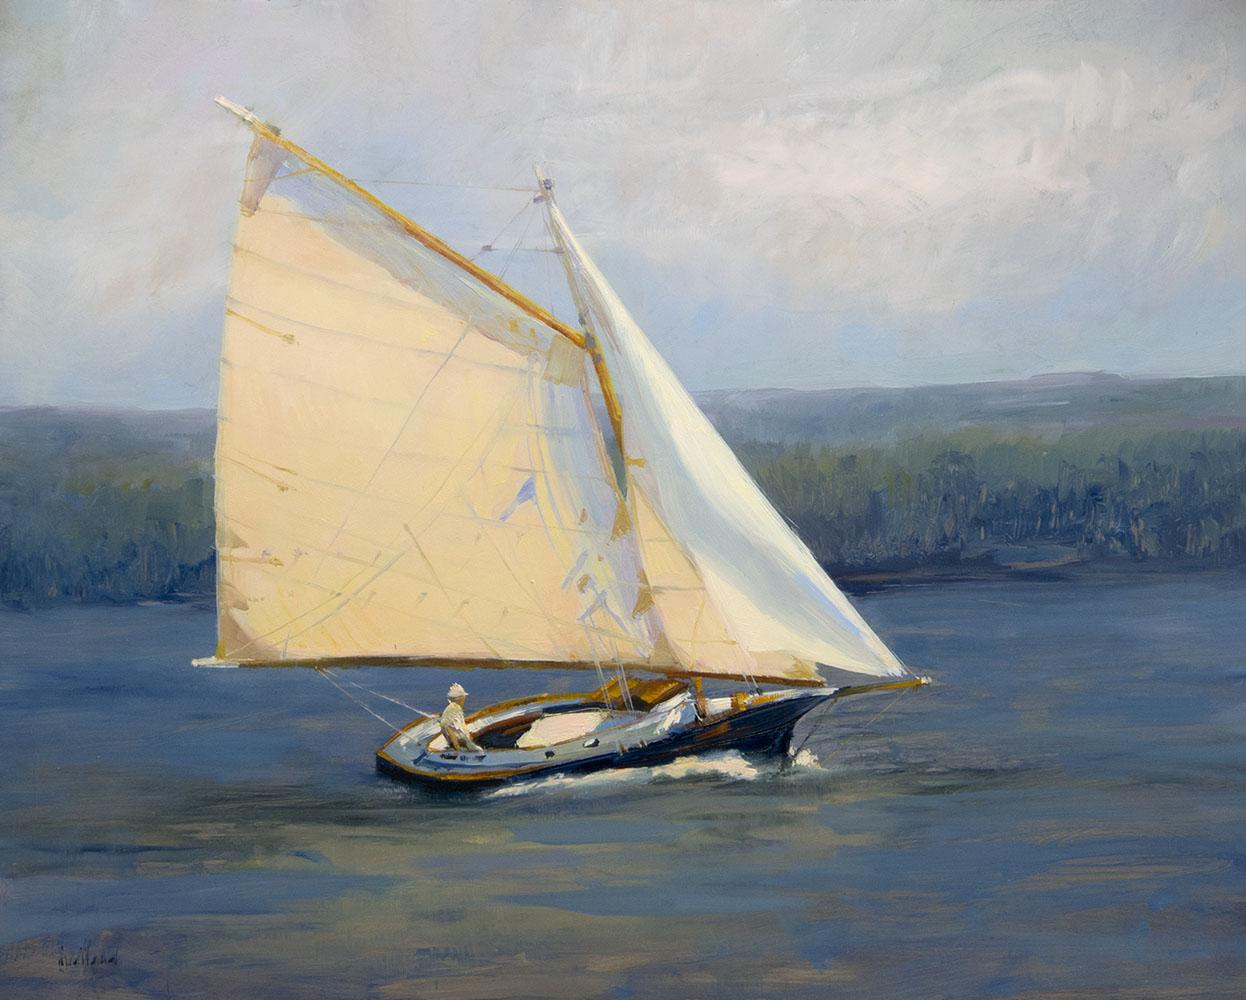 katie_swatland_ks1044_windswept_sails.jpg